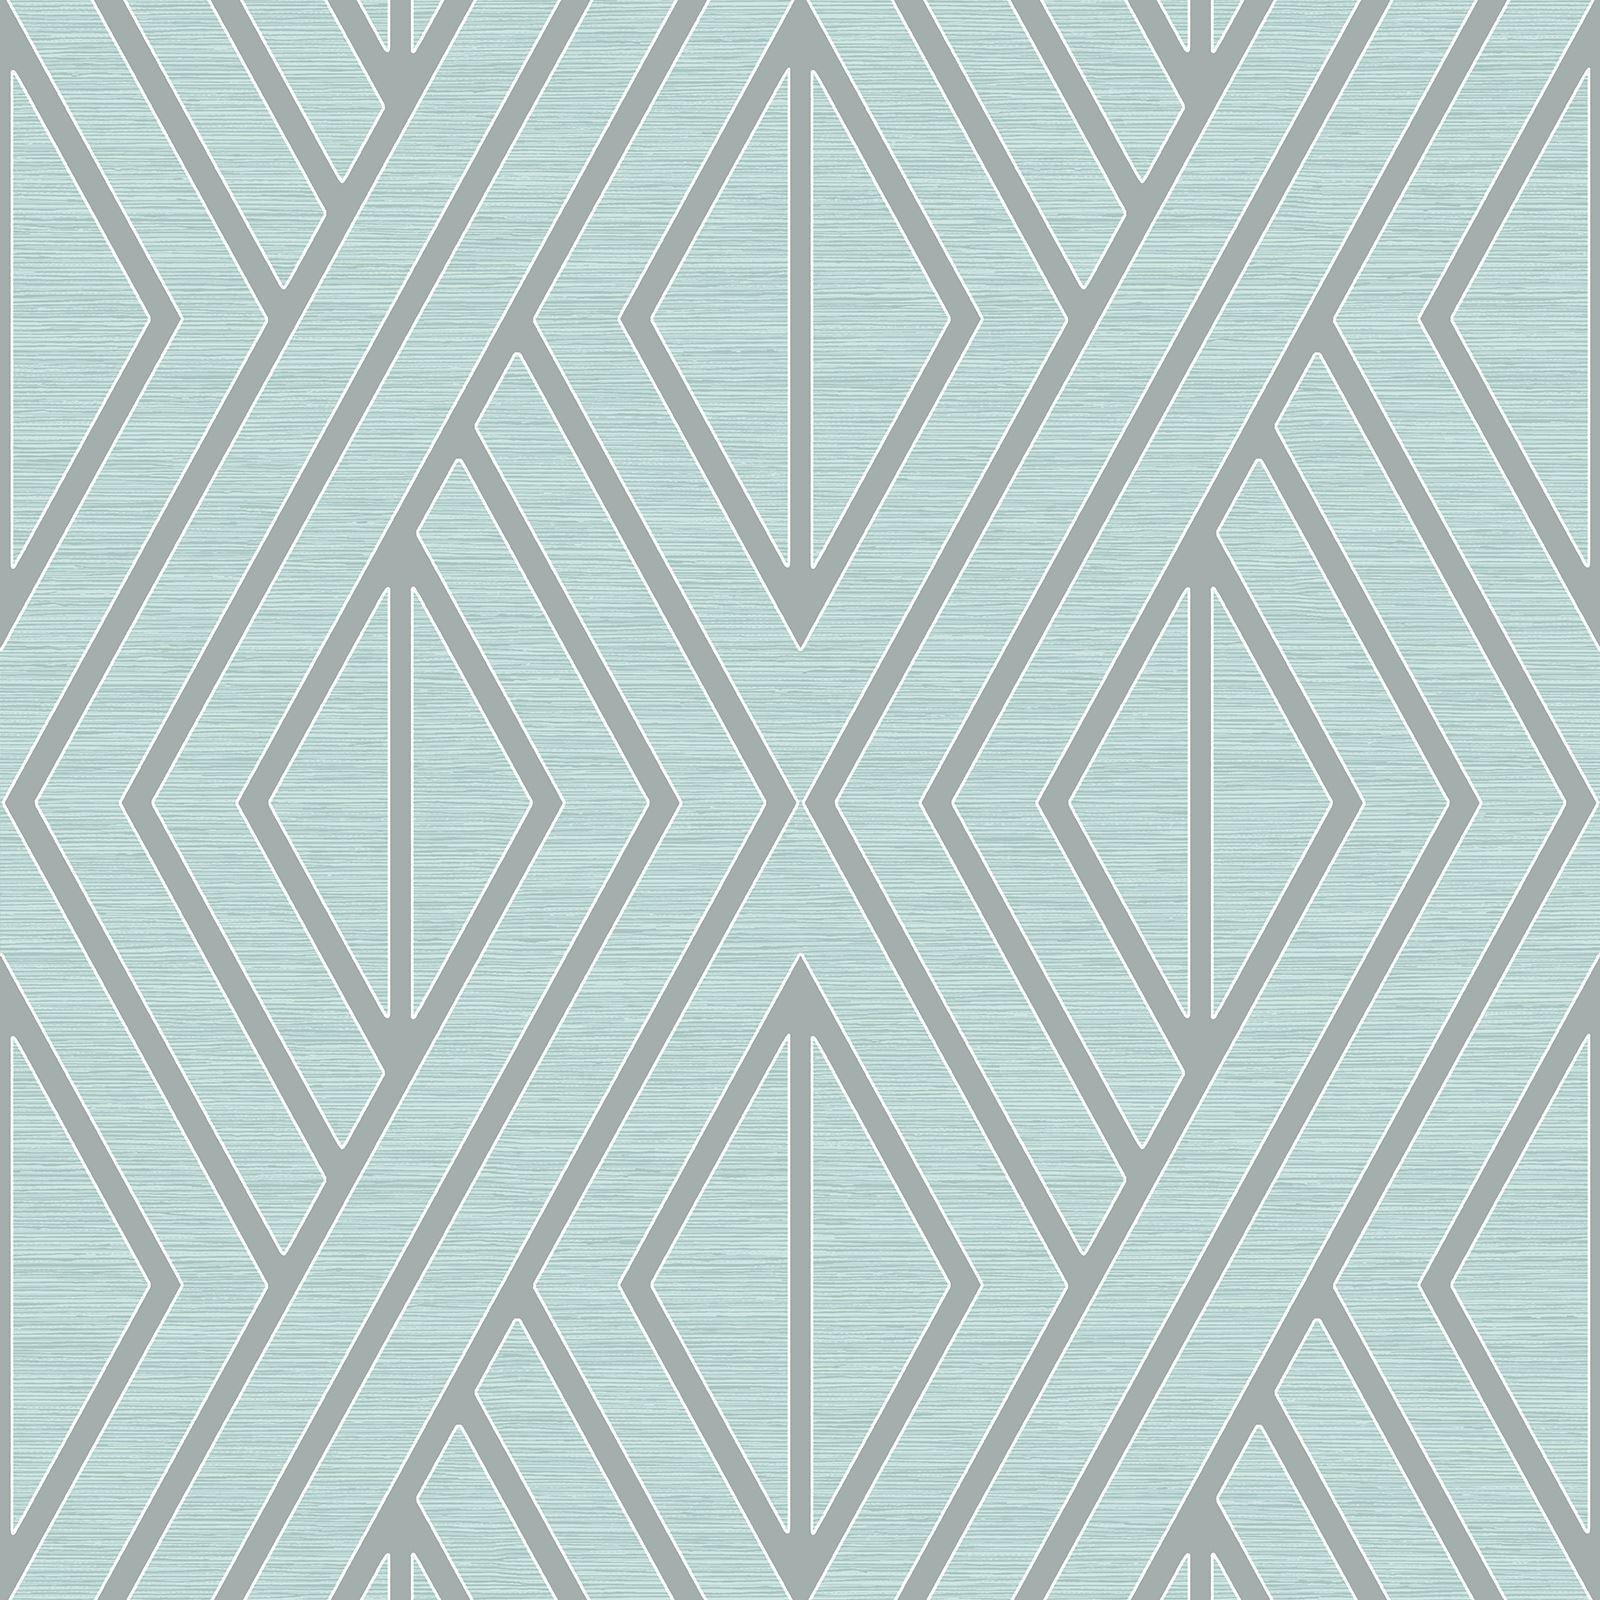 miniatura 50 - Carta da Parati Geometrica Arredamento Camera Moderno Vari Disegni e Colori